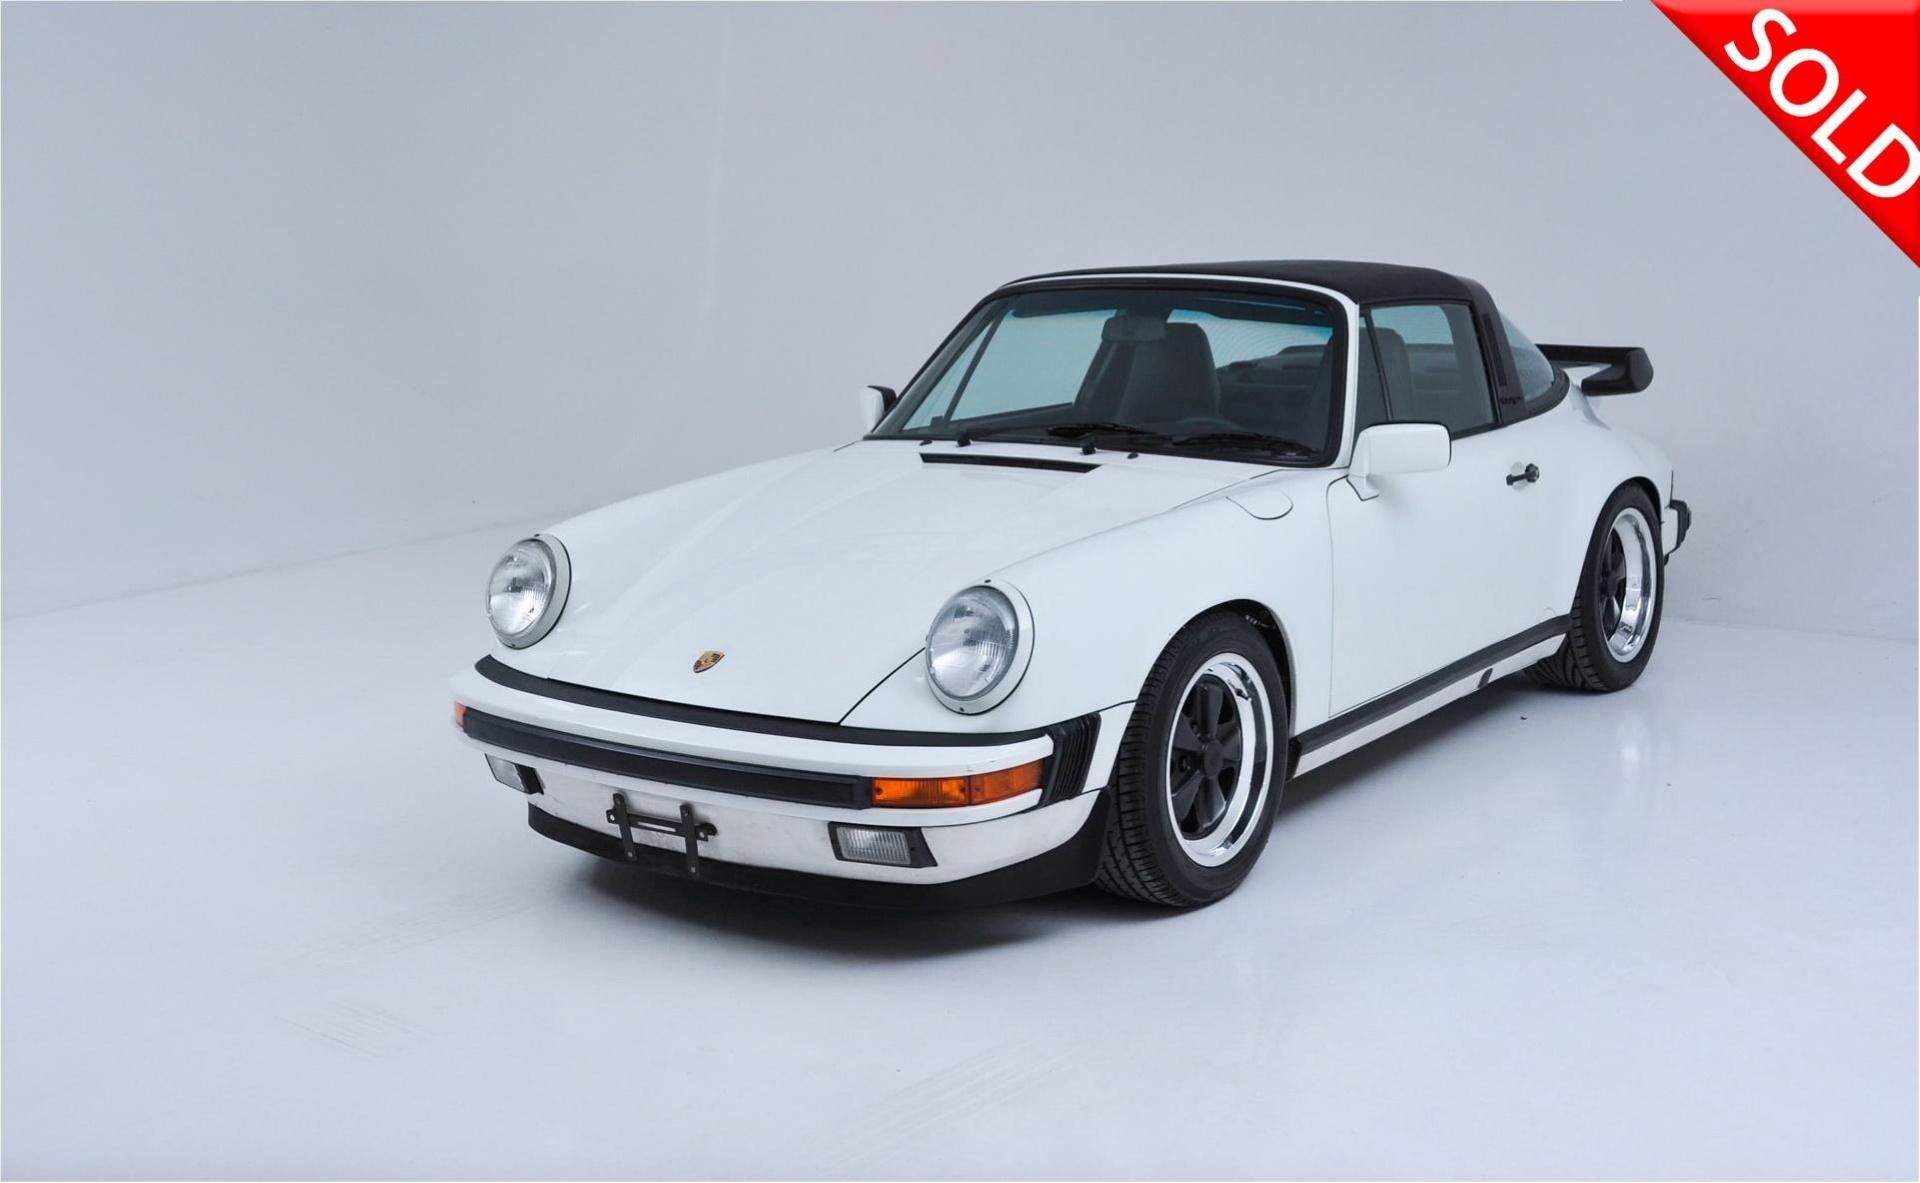 1989 Porsche 911 Carrera Targa Stock 198901 For Sale